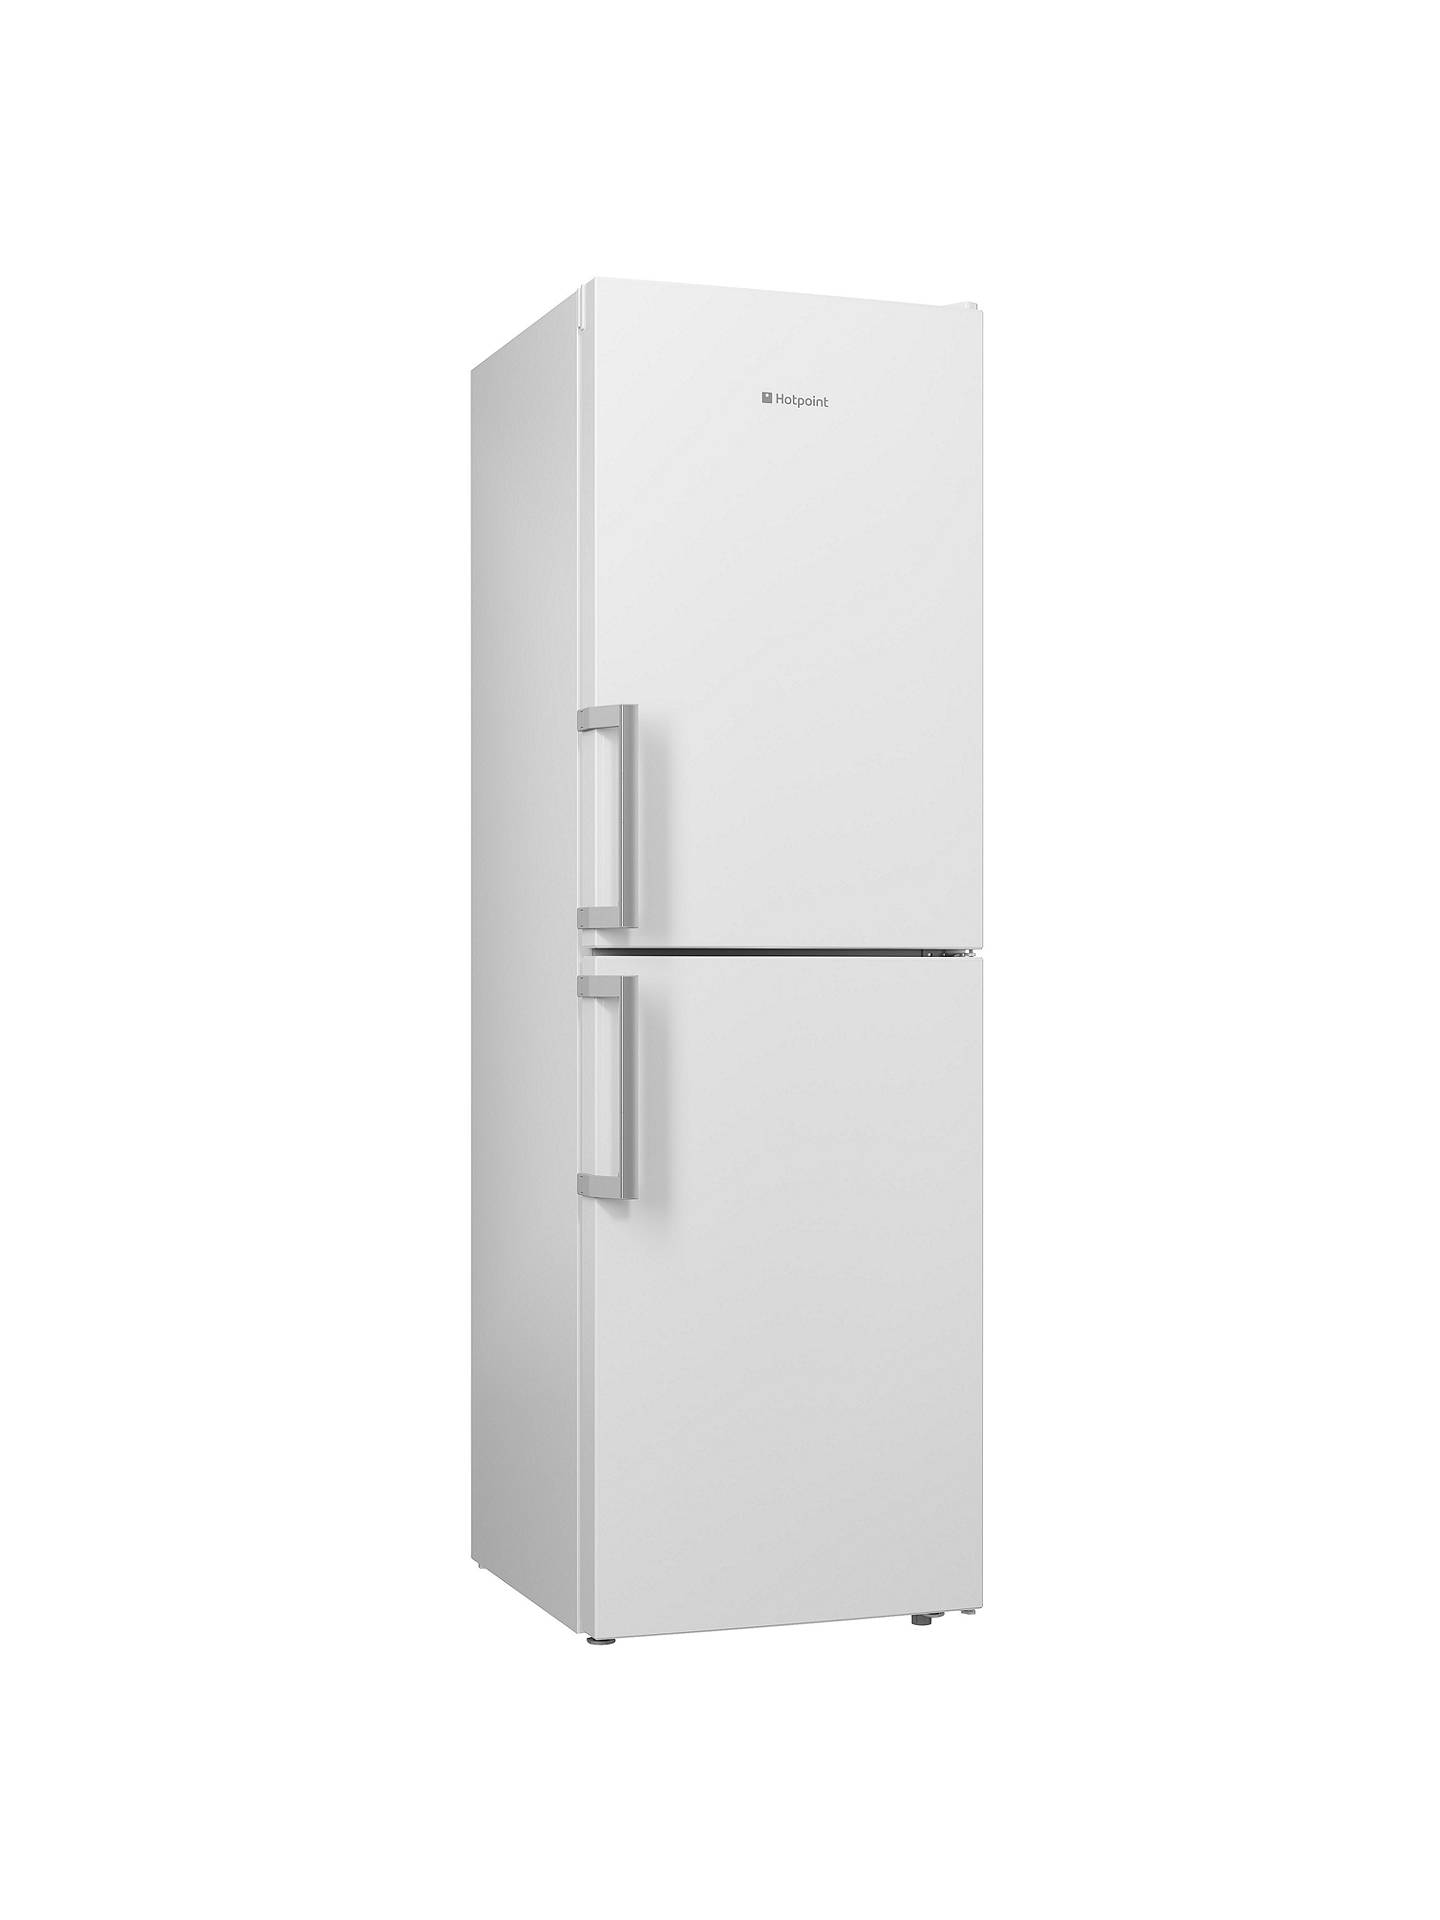 Hotpoint XUL85T3UWOJH Freestanding Ultima Combi Fridge Freezer, A+++ Energy  Rating, 60cm Wide, White